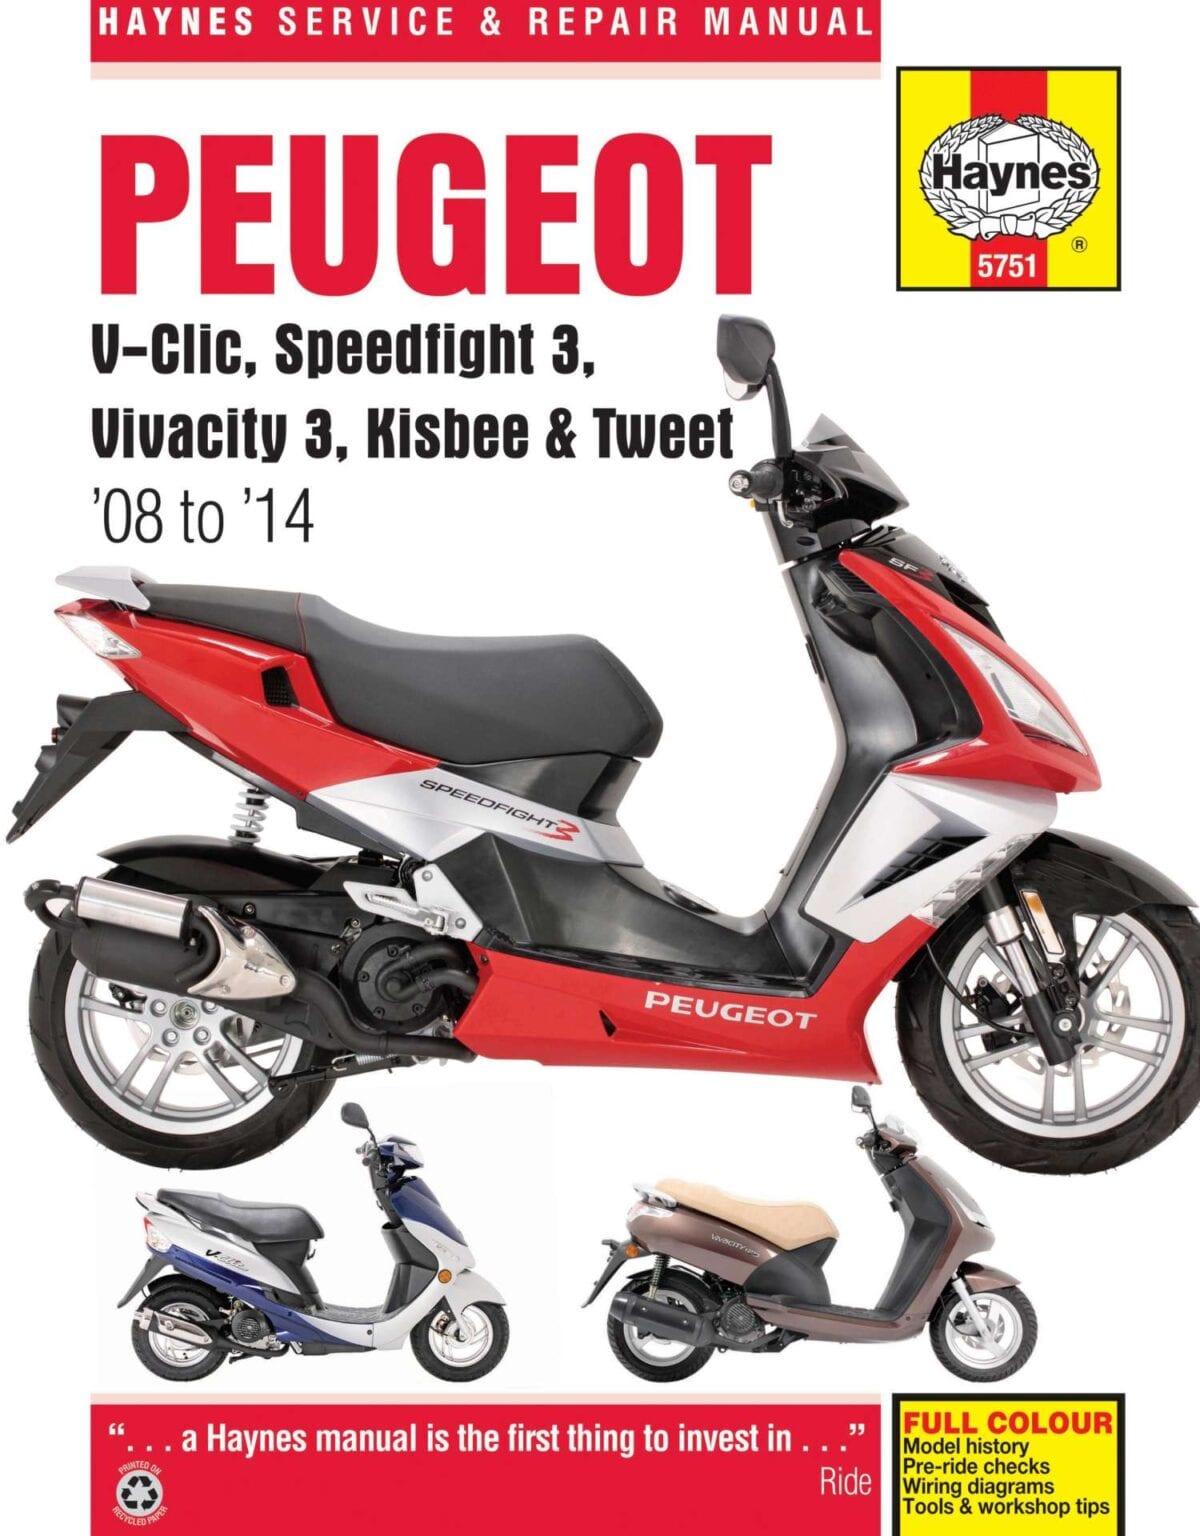 Peugeot-Scooters-haynes-Manual